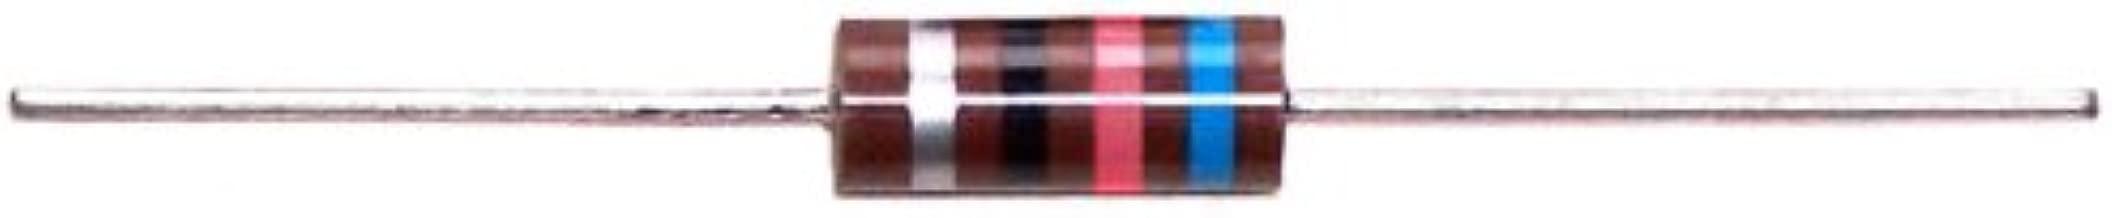 1 watt carbon composition resistor